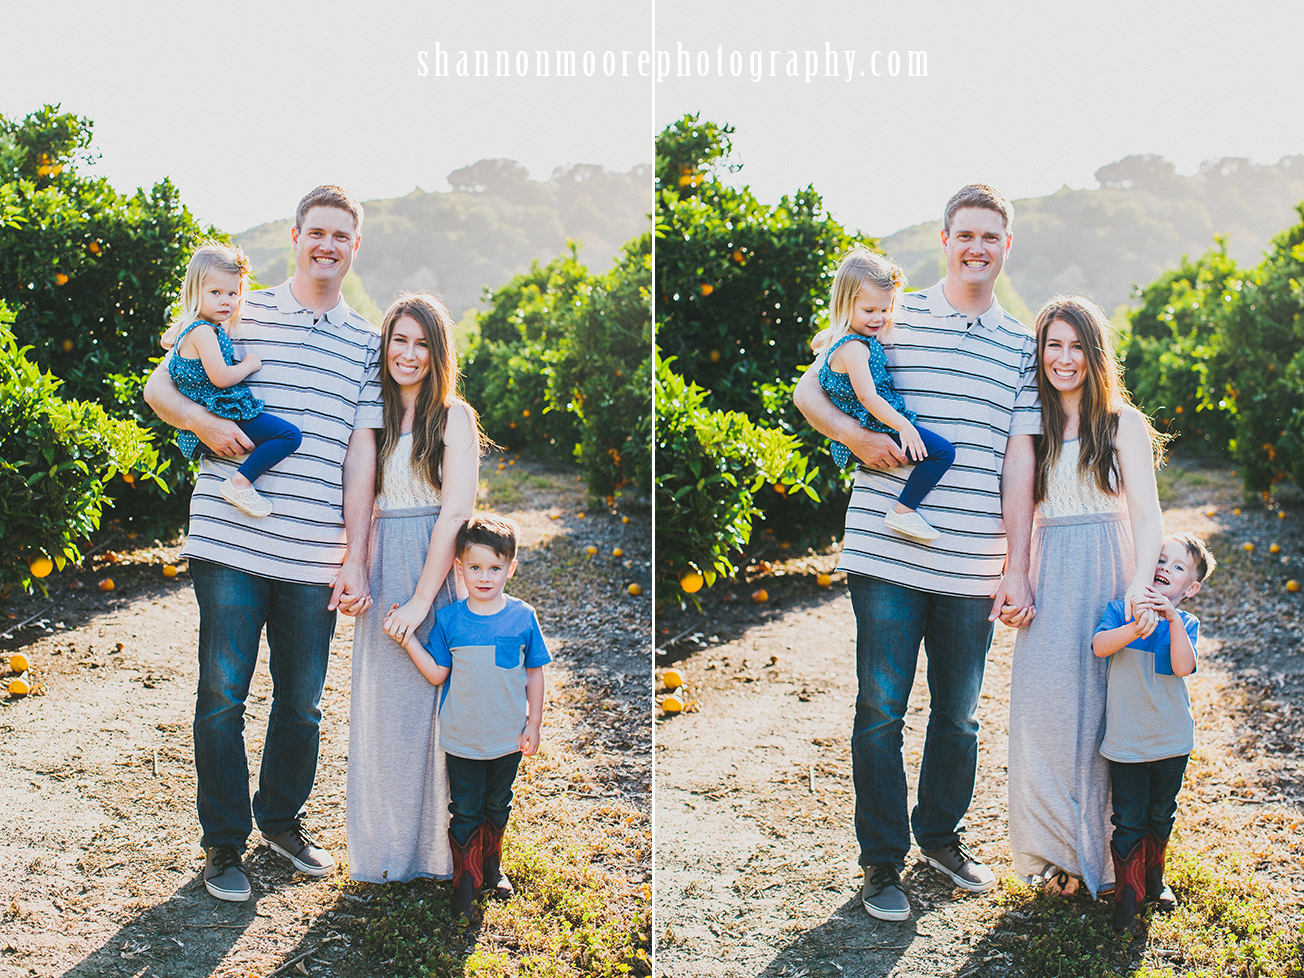 ShannonMoorePhotography-FamilyPhotography-SanLuisObispo-Ca-09